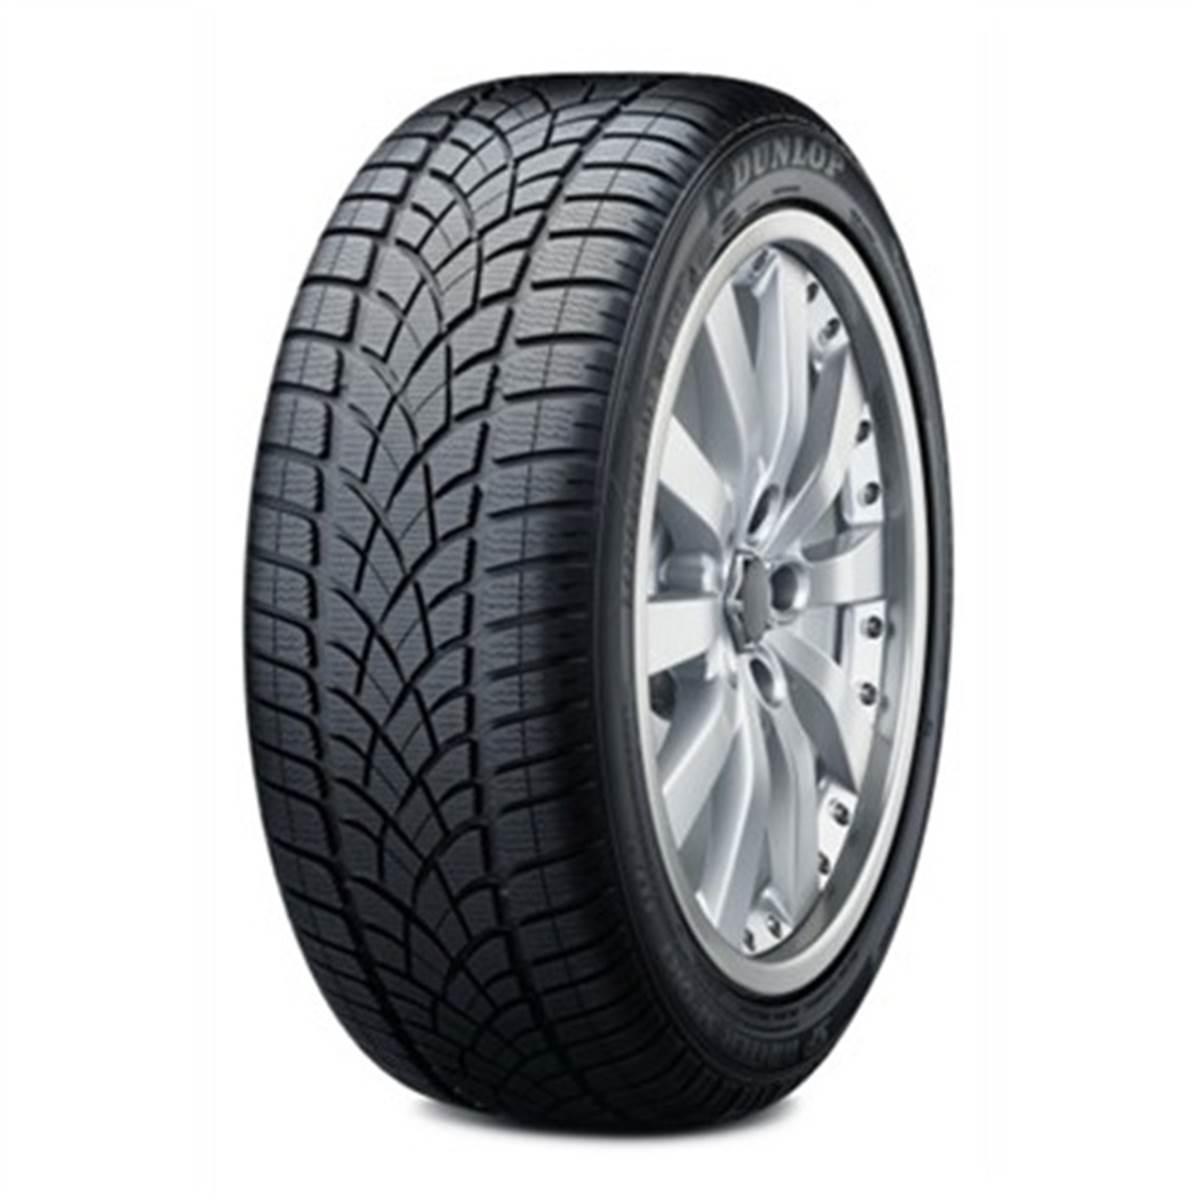 Pneu Hiver Dunlop 255/40R18 95V Sp Winter Sport 3D